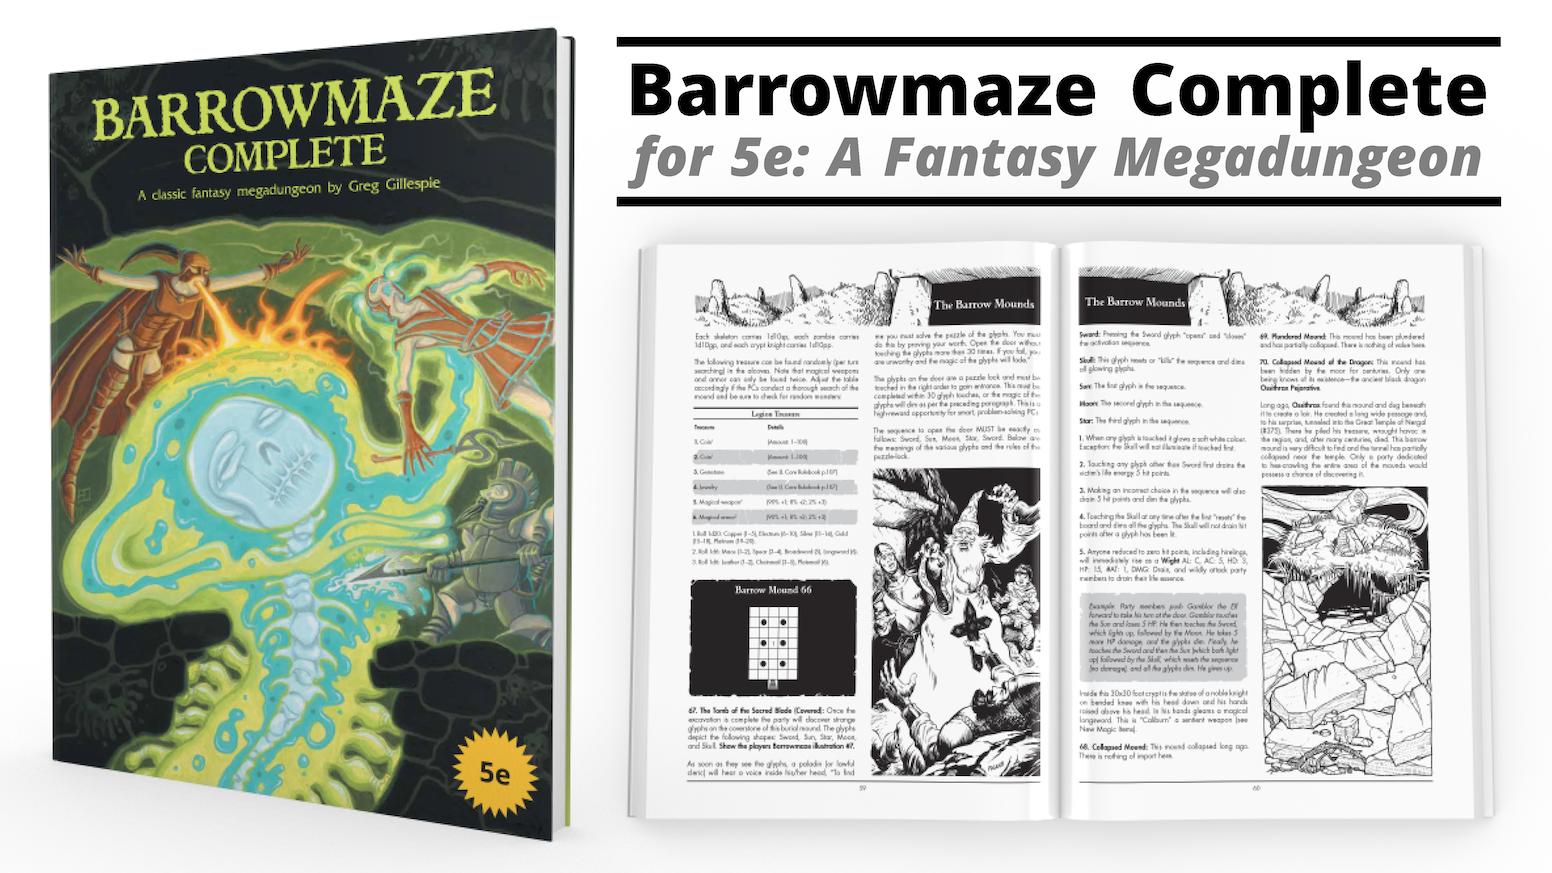 Barrowmaze Complete for 5e by Rogue Comet — Kickstarter